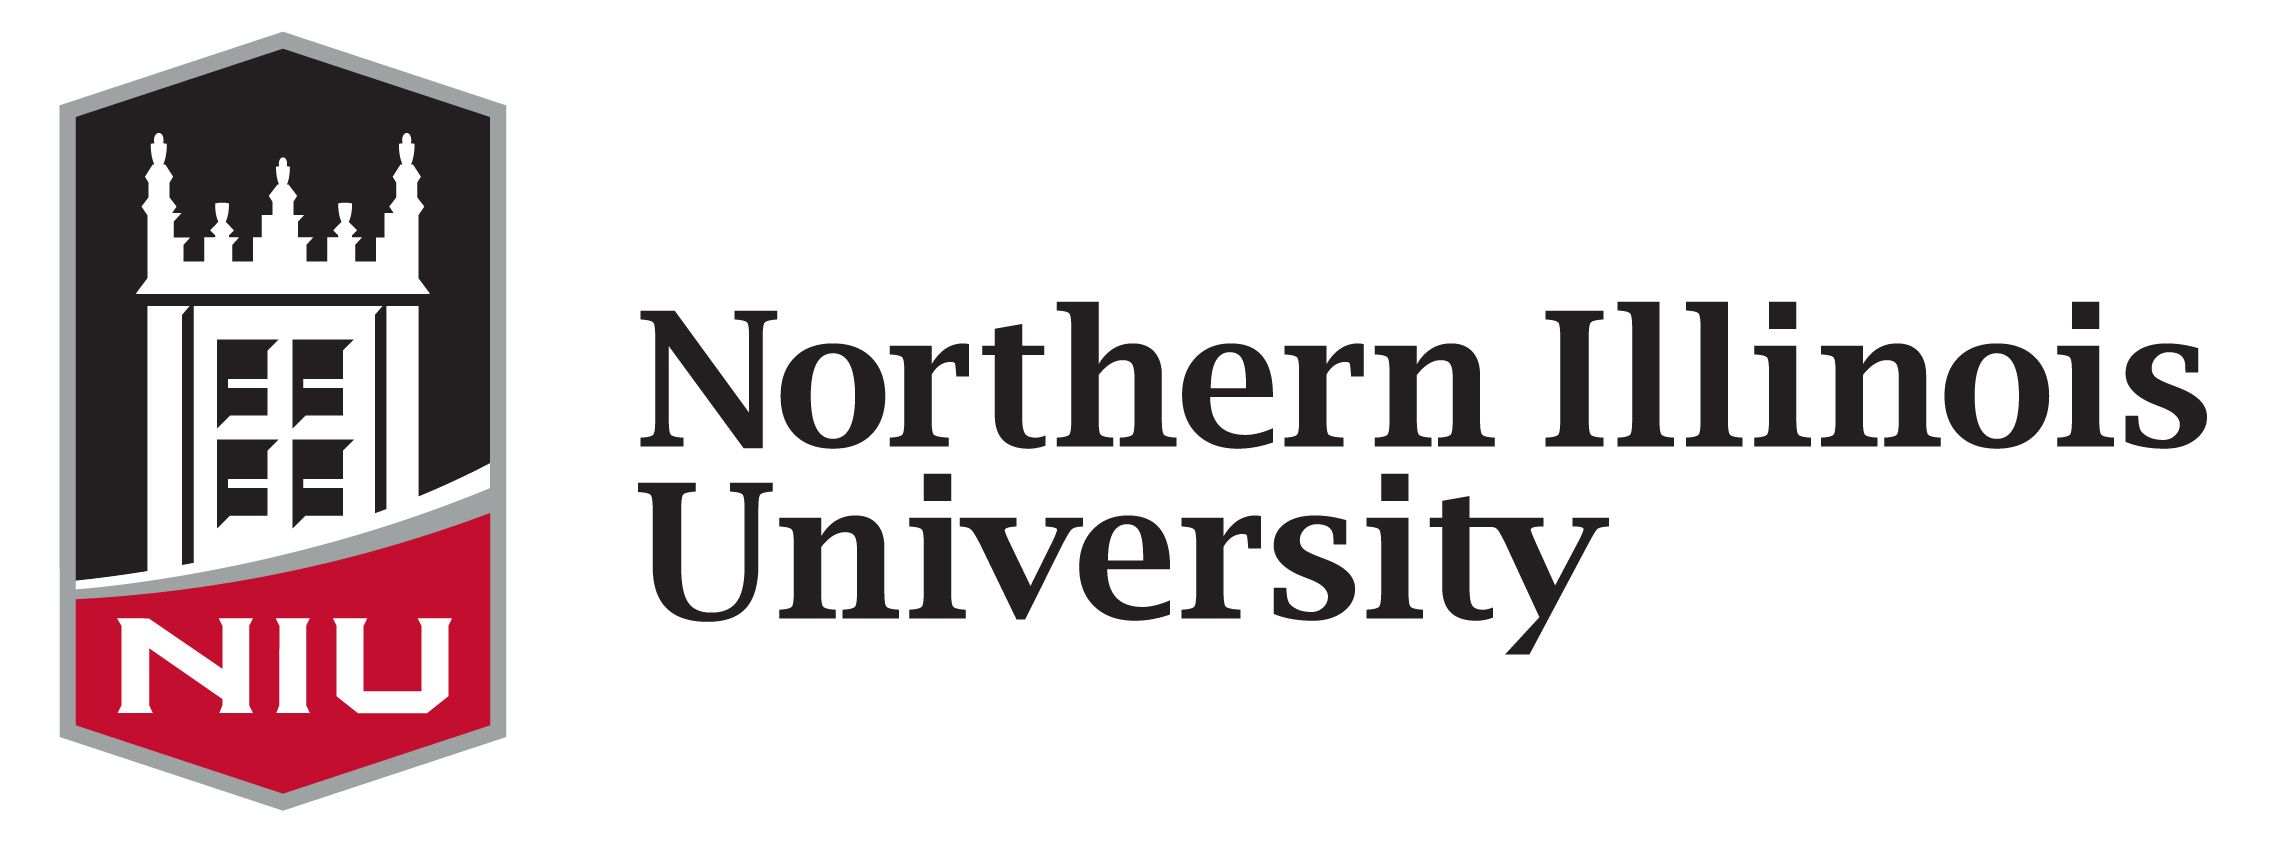 Niu Logo Northern Illinois University Northern Illinois University University Logo College Degree